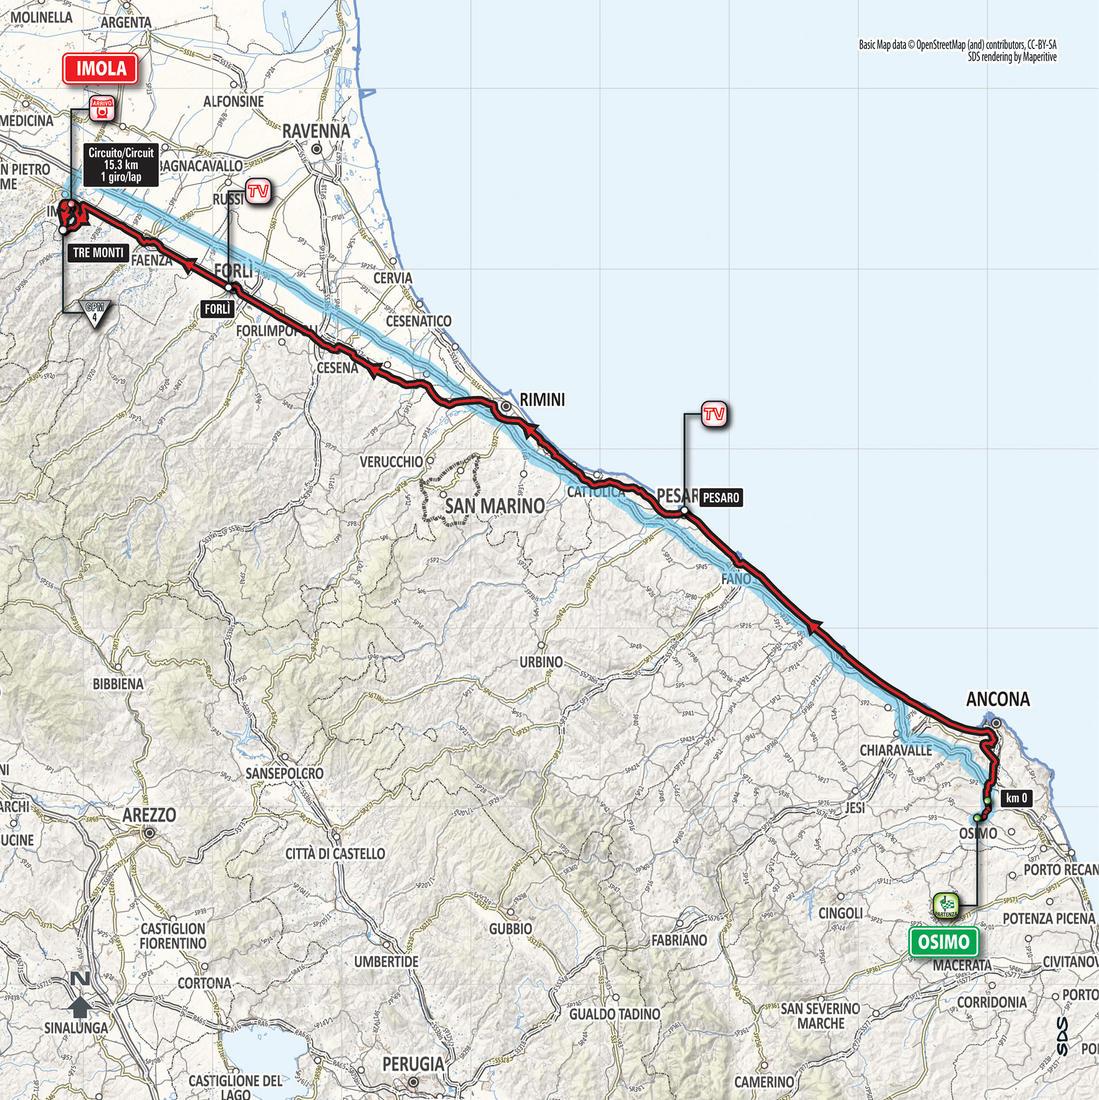 Giro d'Italia 2018 - Stage 12 - Spoilers Allowed-giro2018_stage-12-map.jpg